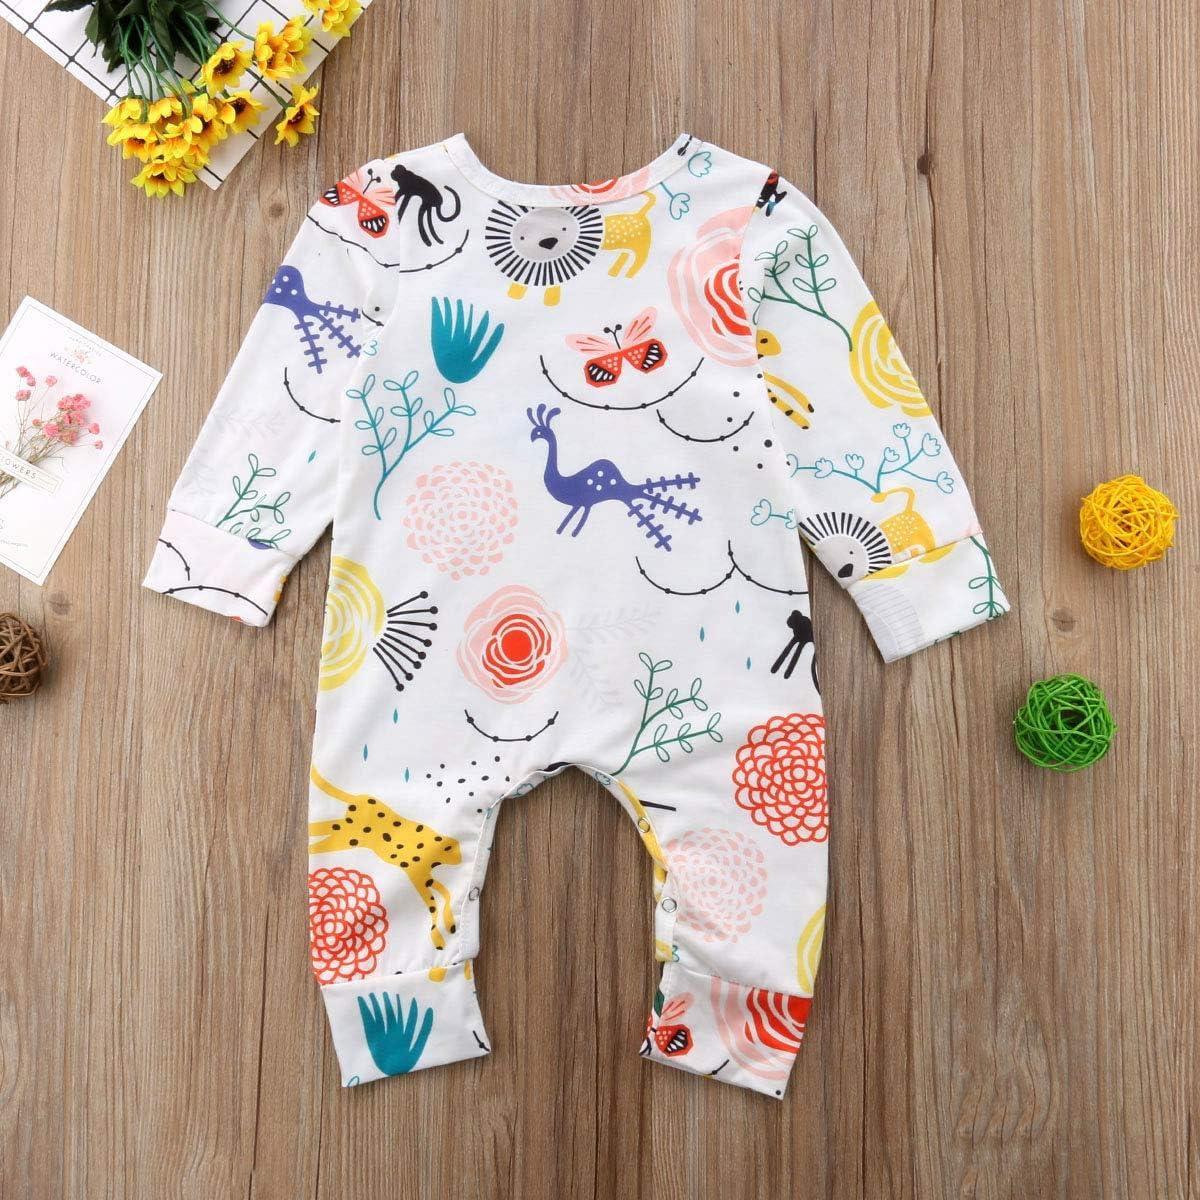 TJTJXRXR Infant and Toddler Baby Girls Cartoon Denim Dinosaur Printed Pants and Trousers